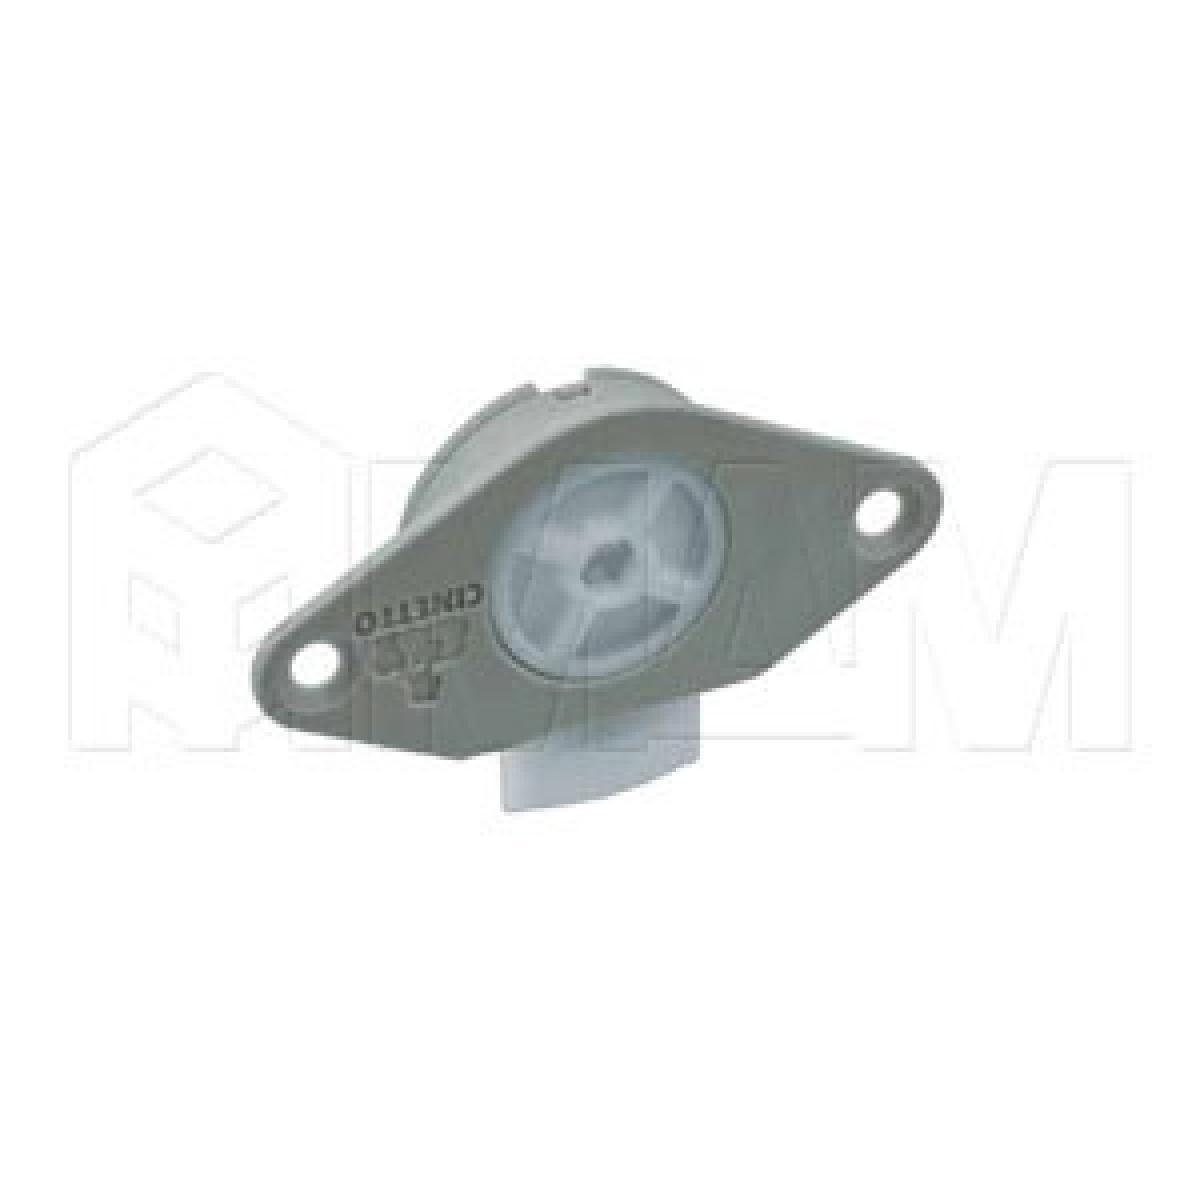 PS22 Ролик нижн. с шар. подш., 40 кг/дверь, серый